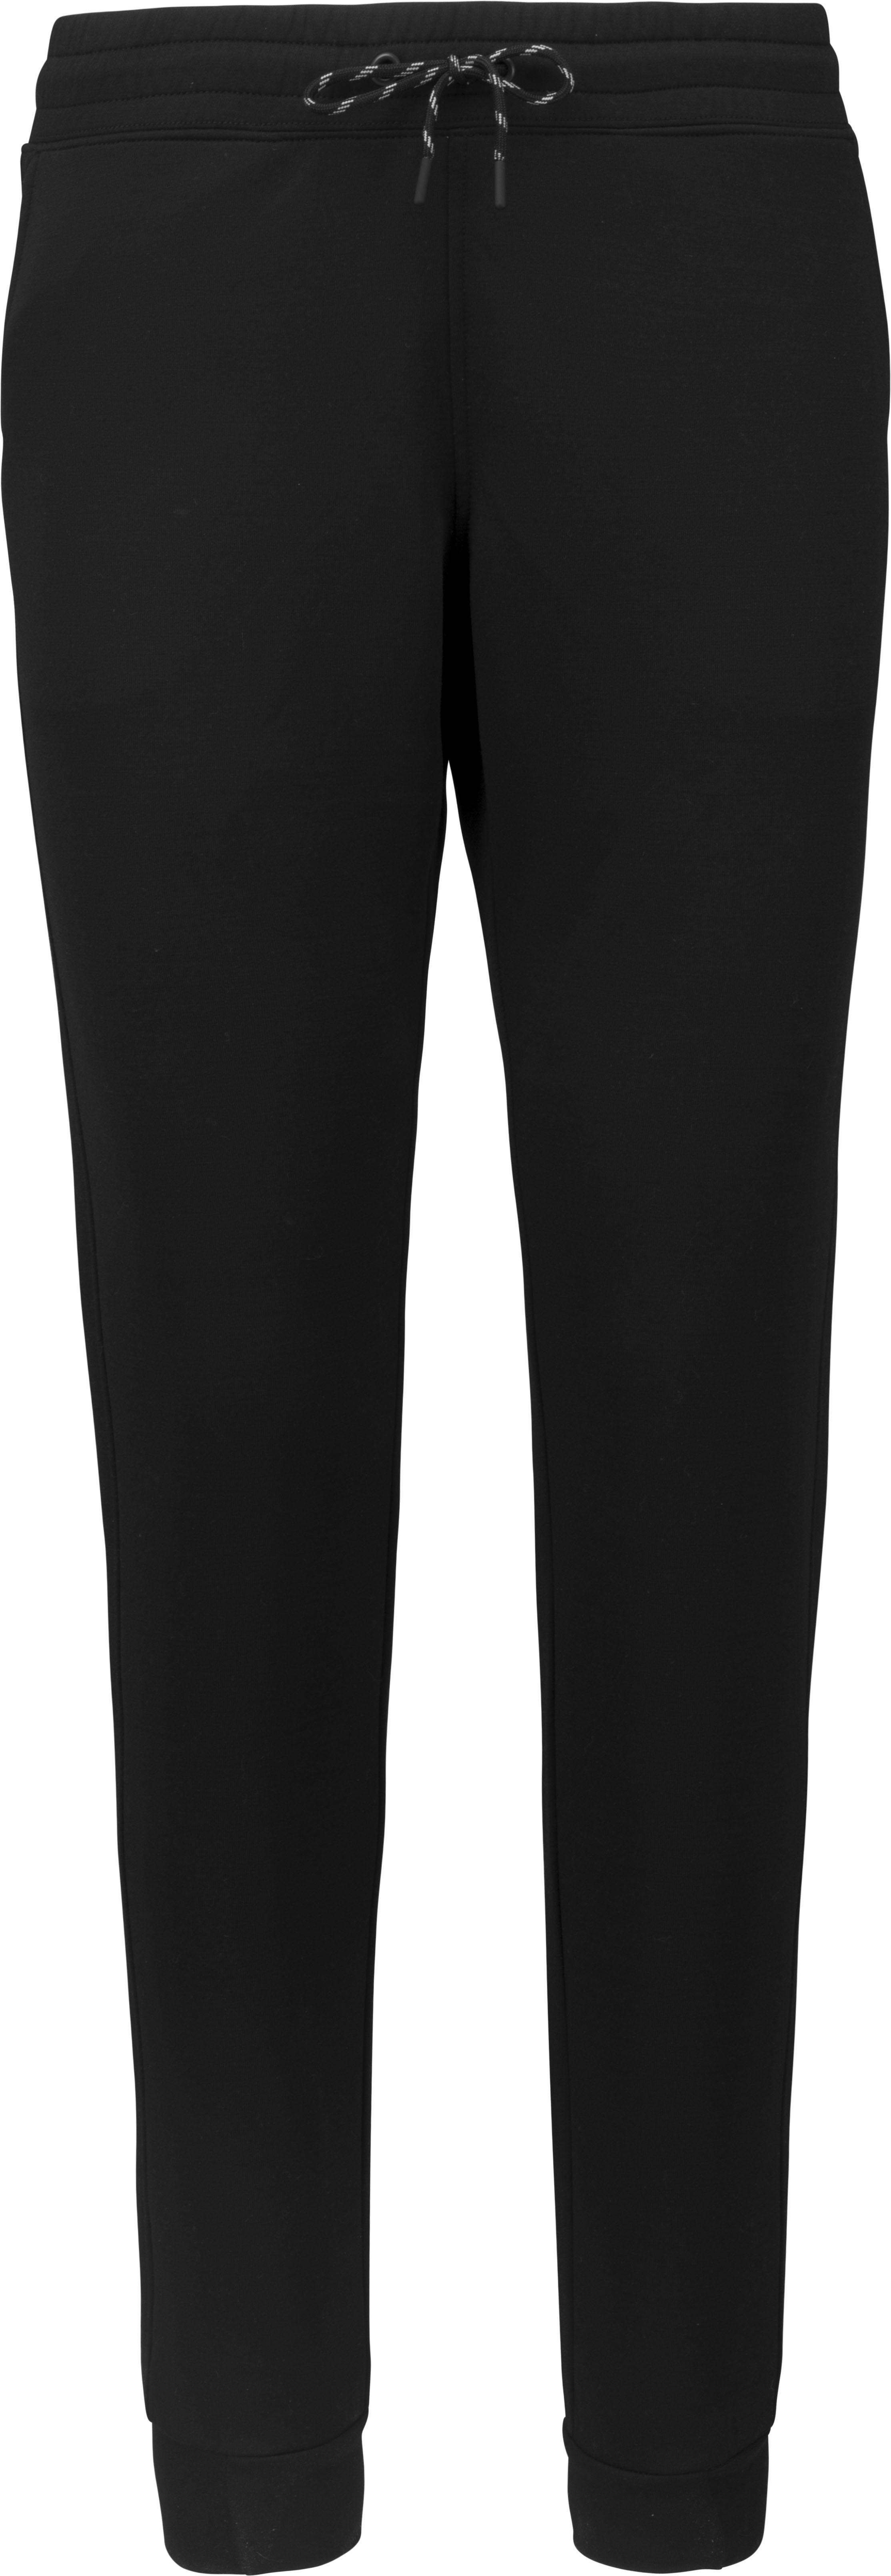 Pantalon femme - 2-1653-1